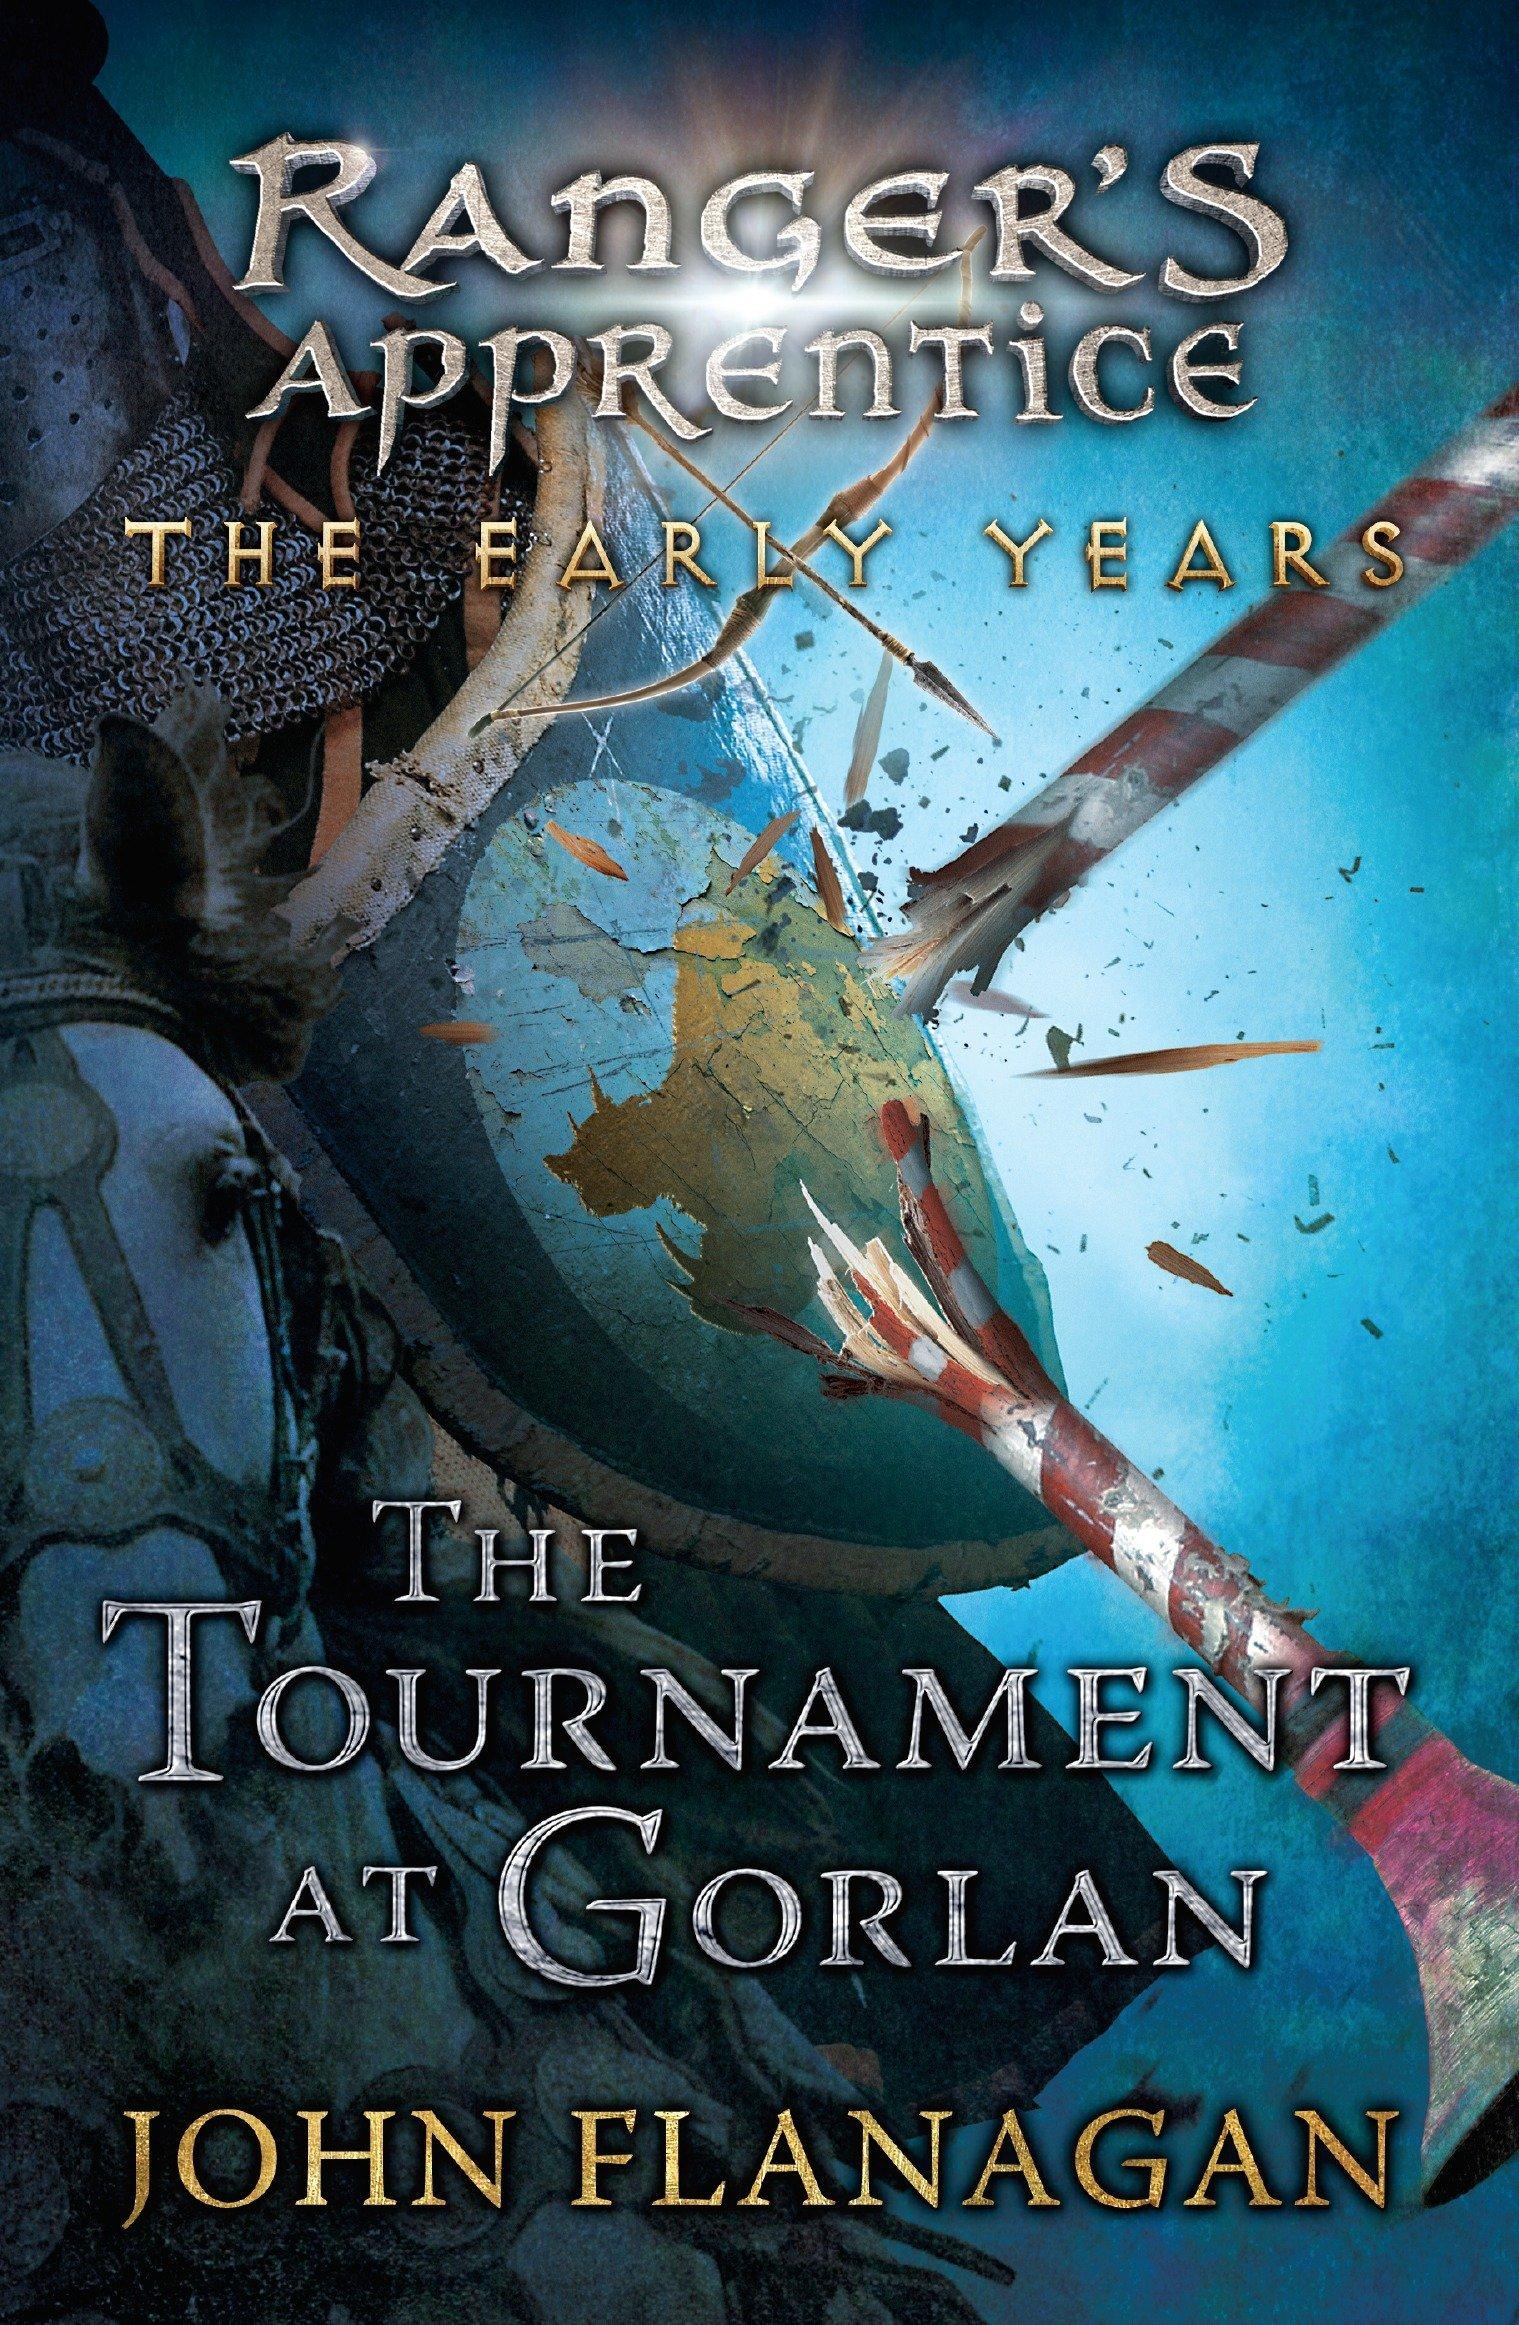 Ranger's Apprentice: The Tournament at Gorlan - John Flanagan